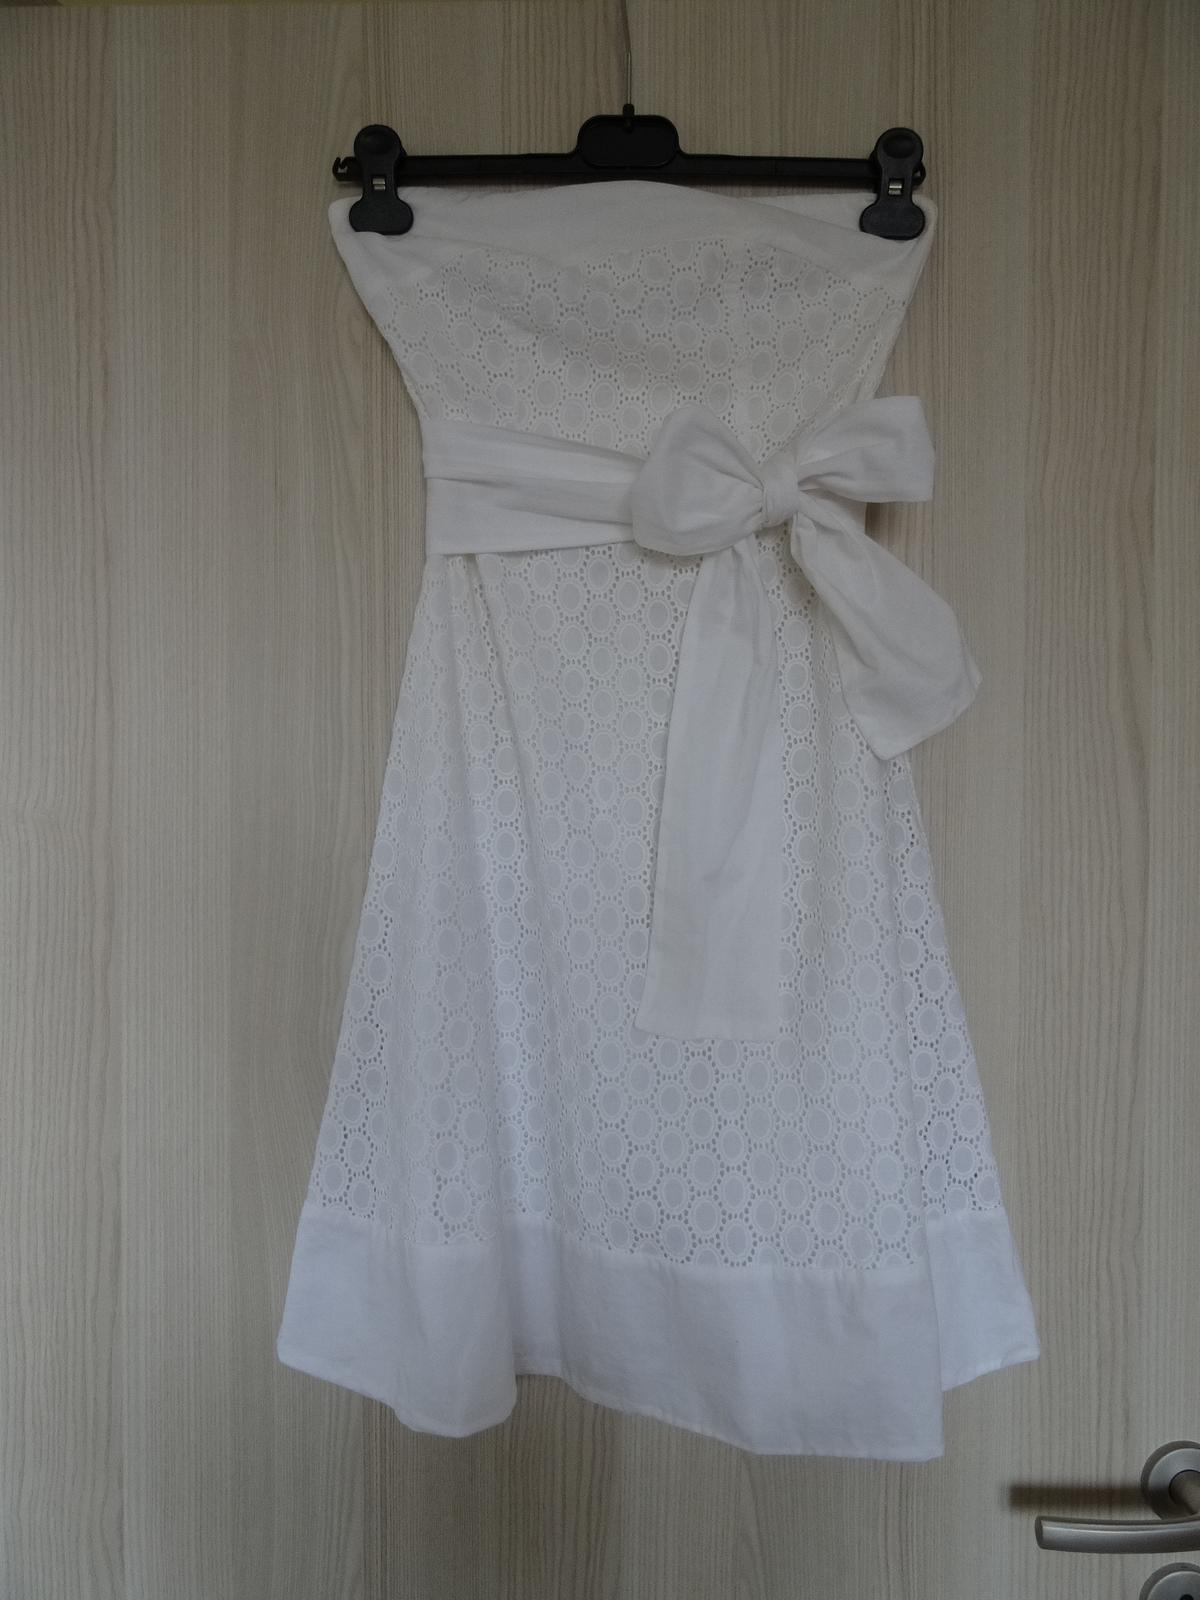 ed30fa762b7 Šaty s uvazovací mašlí